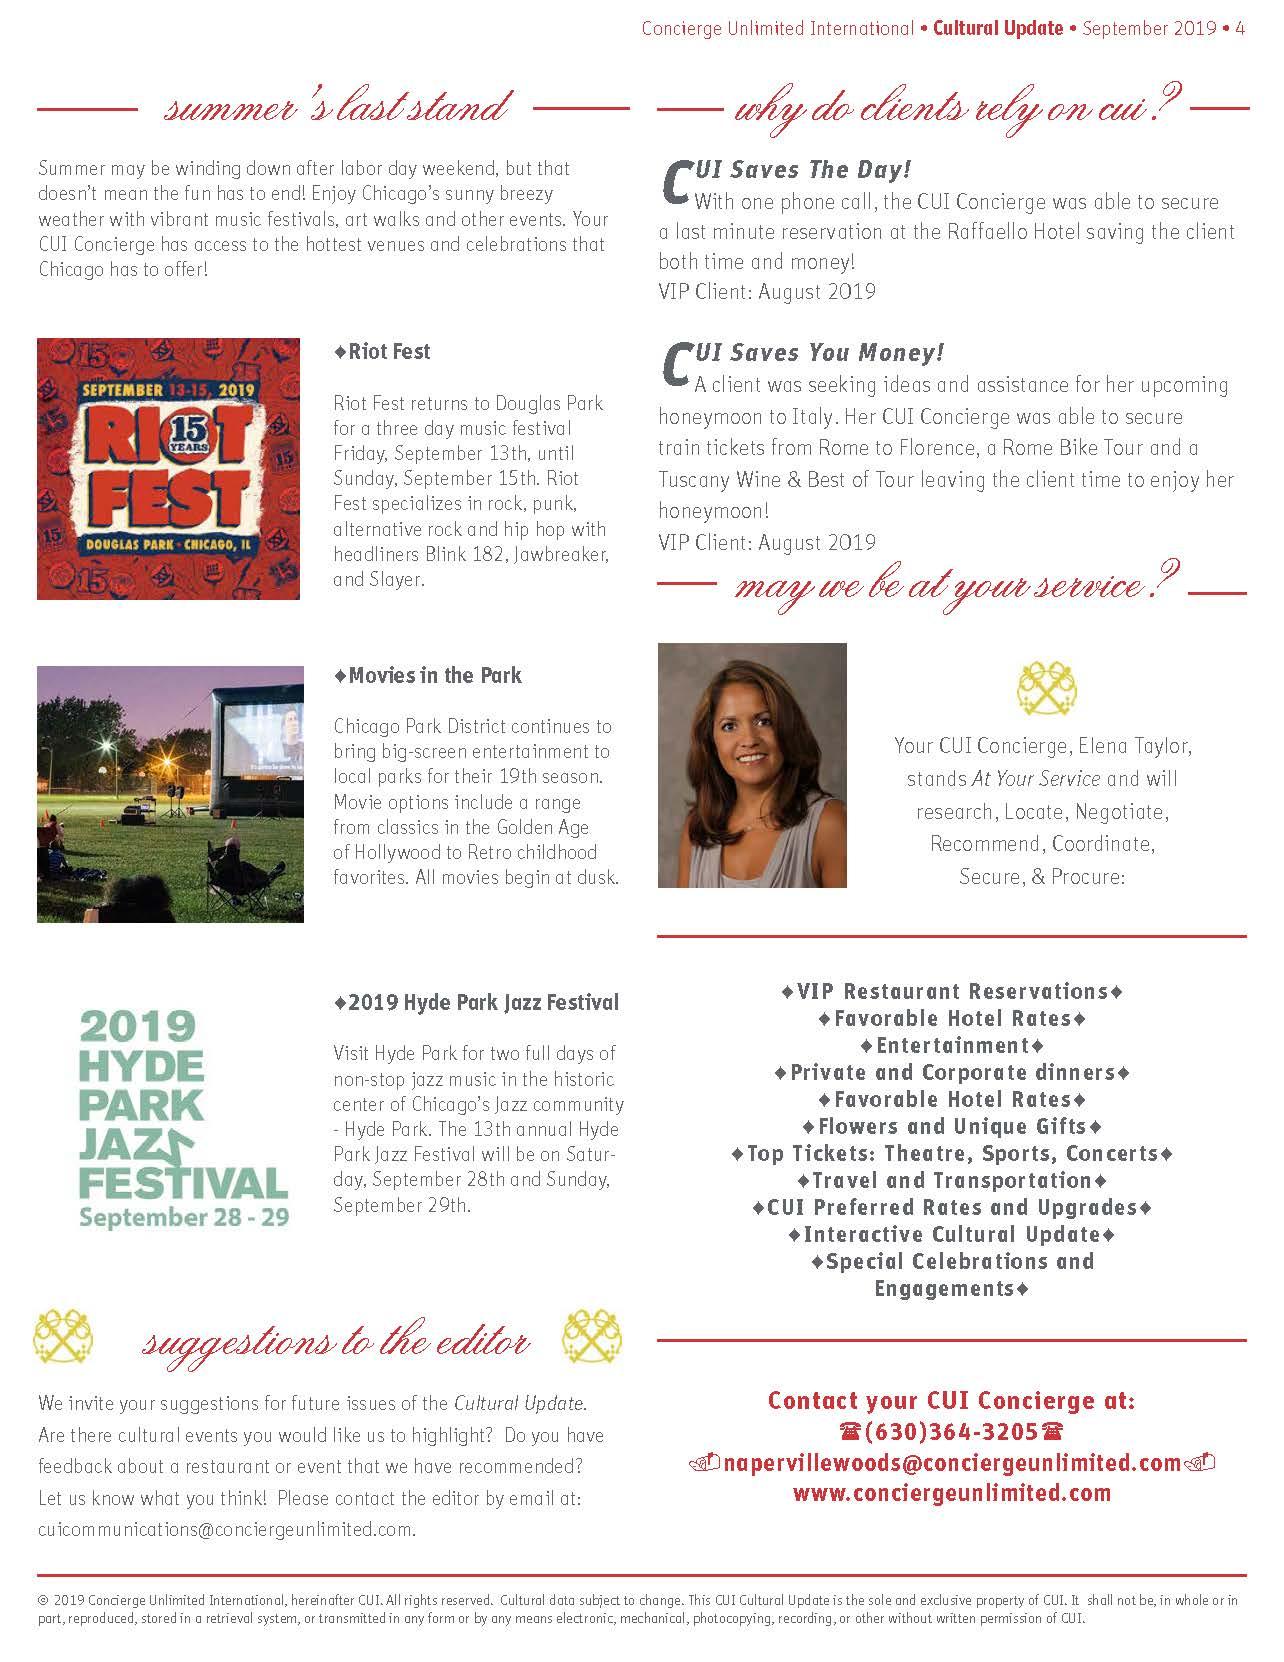 September Cultural Update_Page_4.jpg